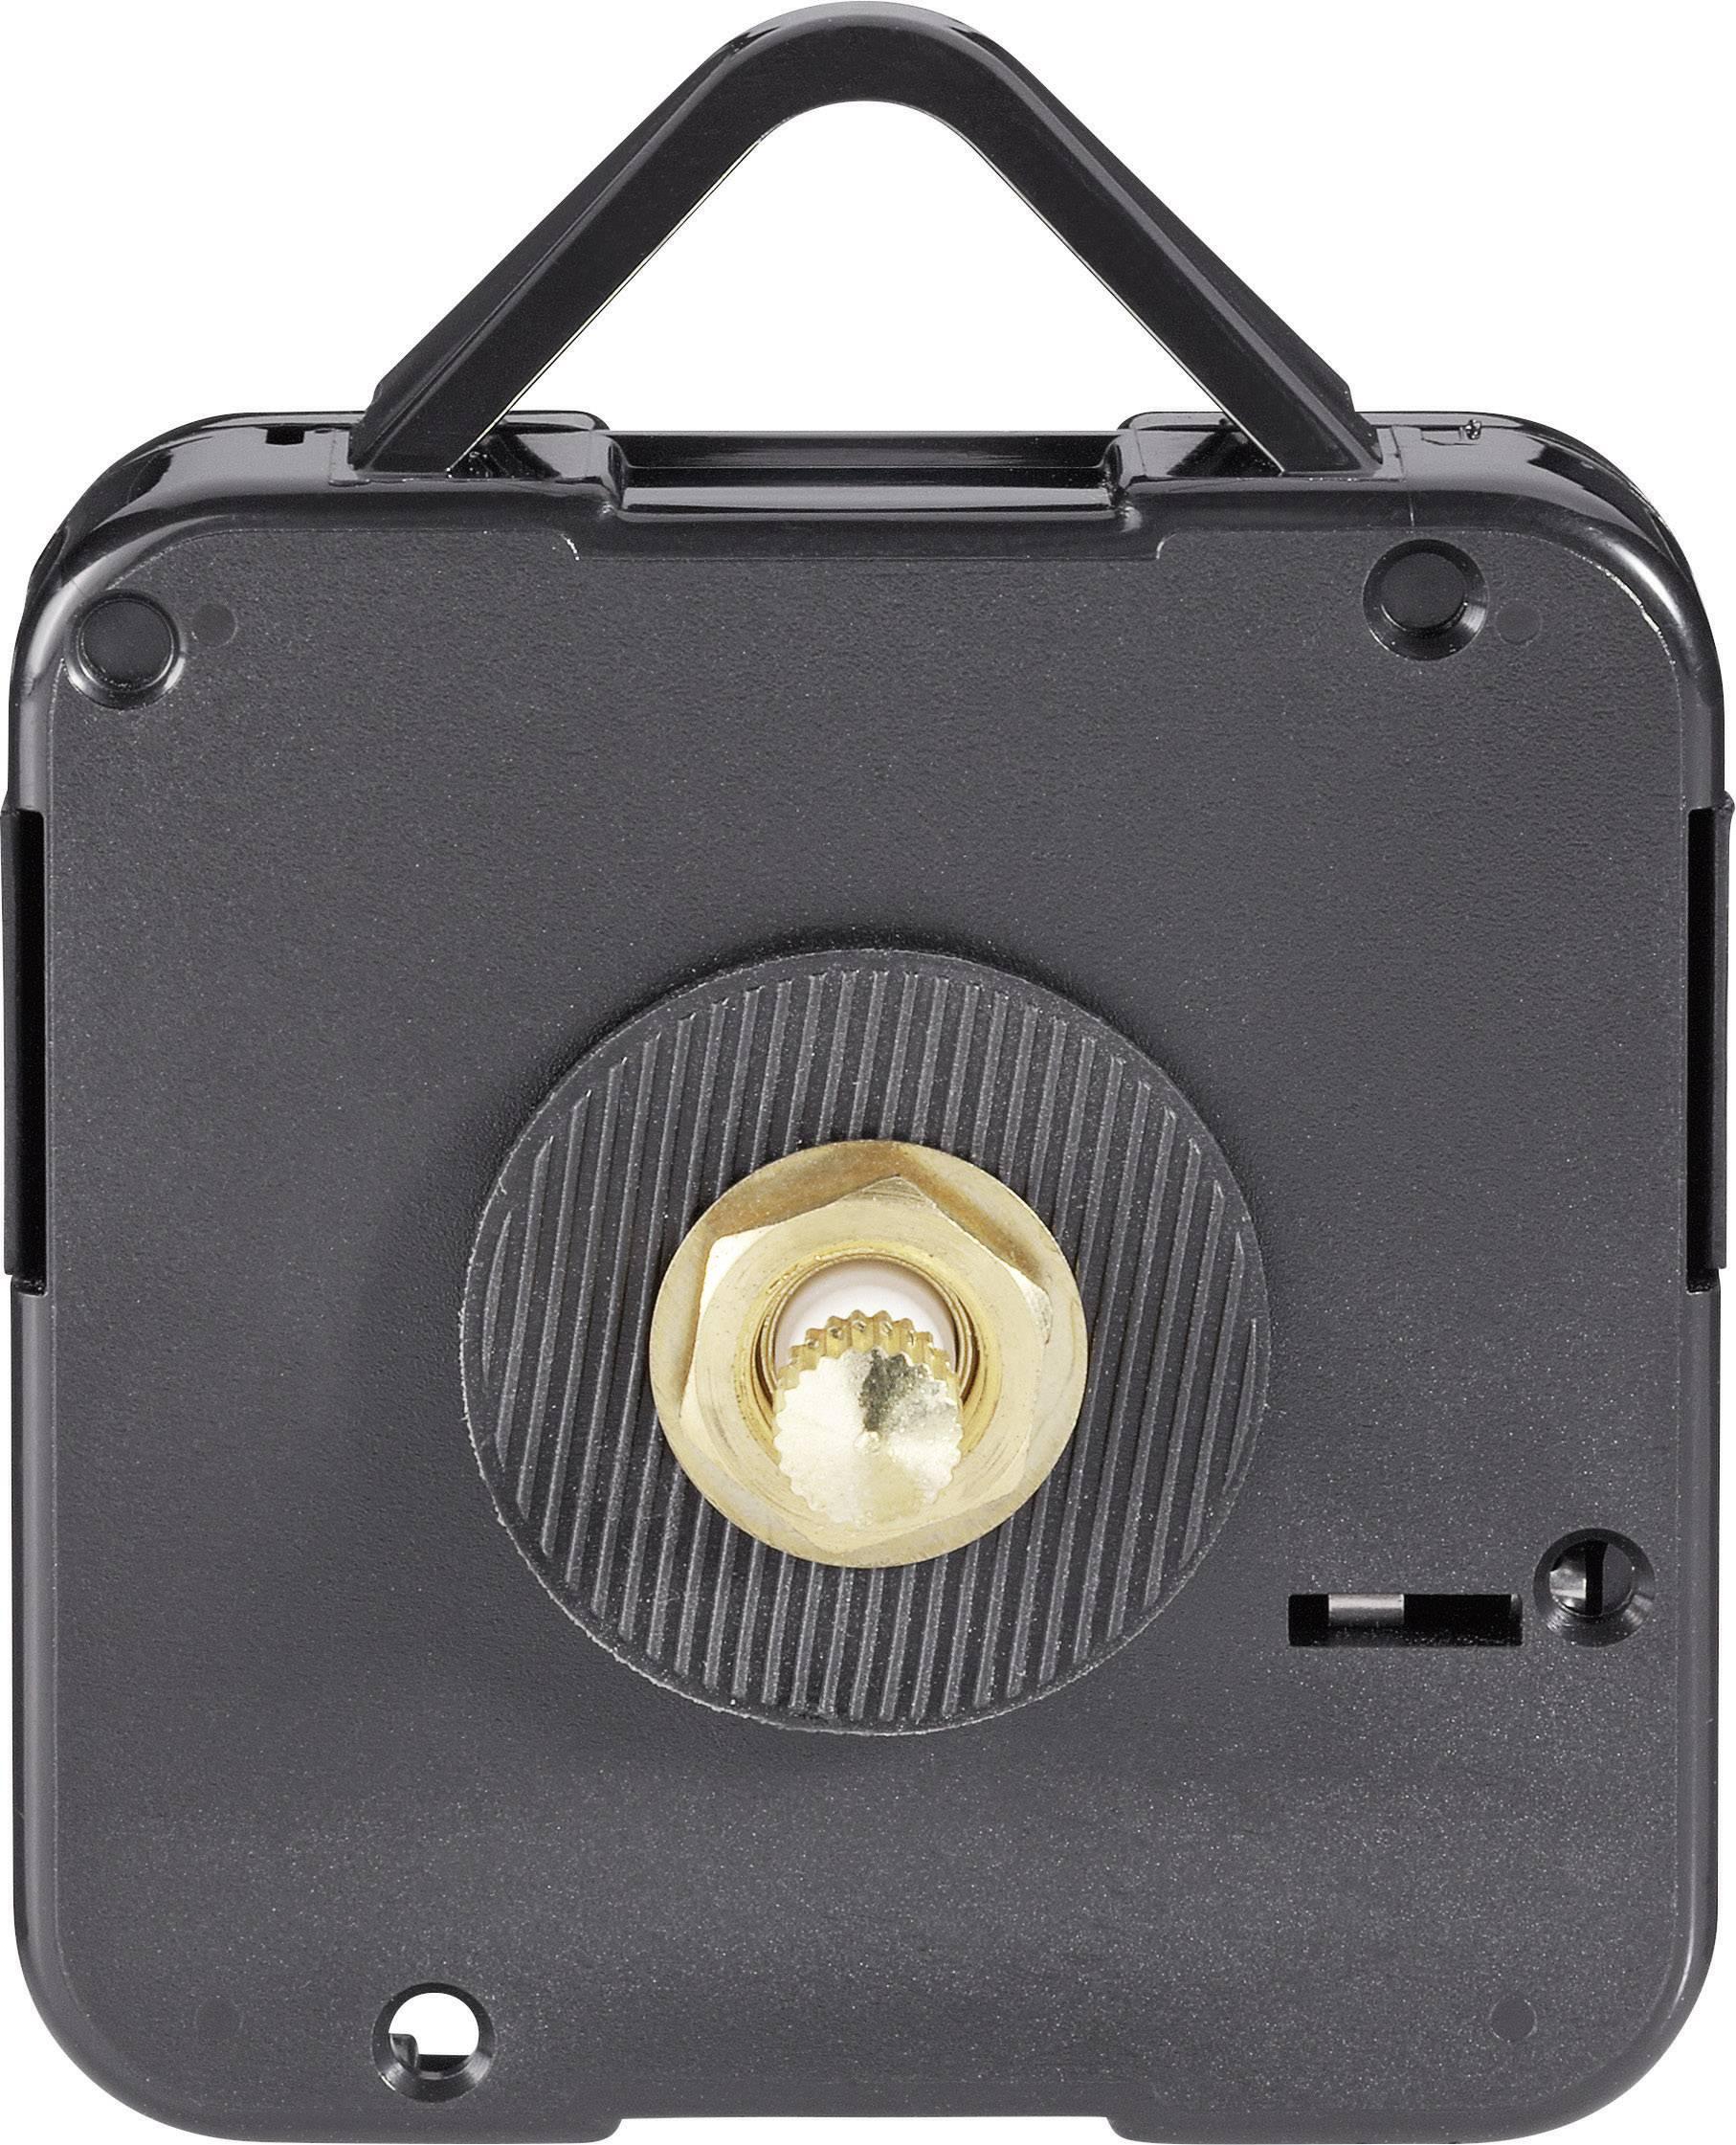 Quartz hodinový strojček HD 1688 9080c10a,11.3 mm